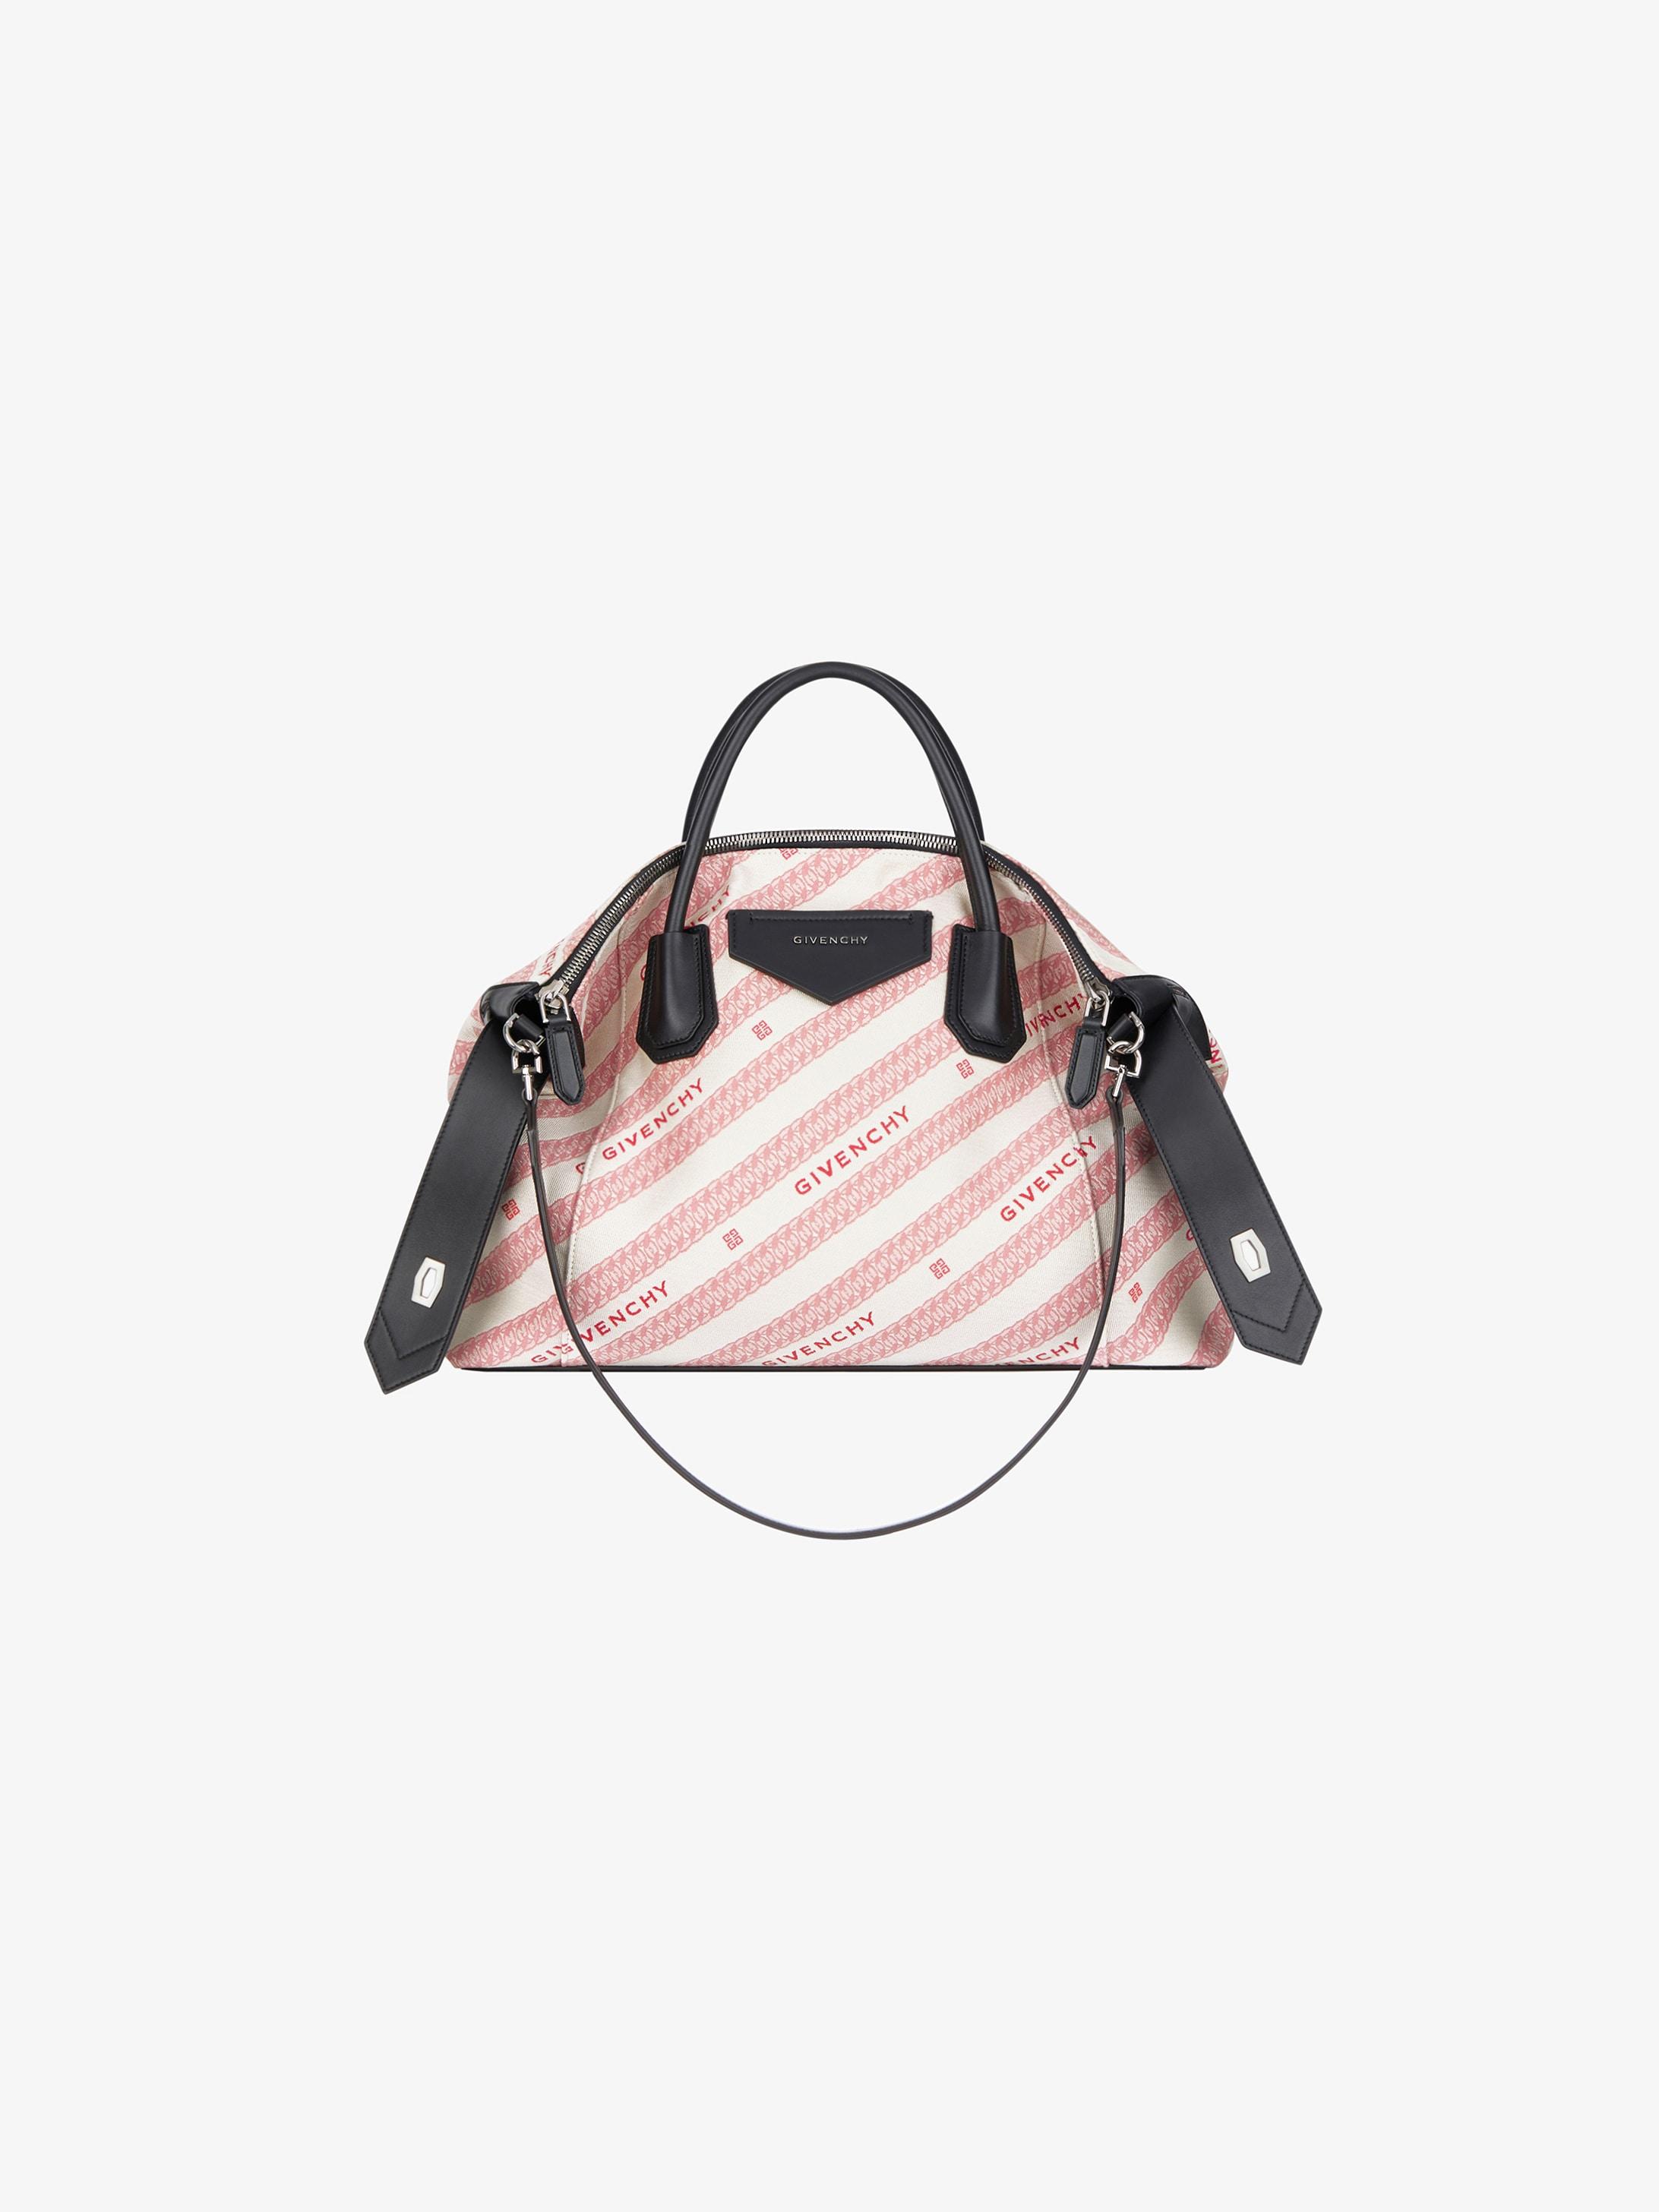 Medium Antigona Soft bag in GIVENCHY jacquard chain and leather